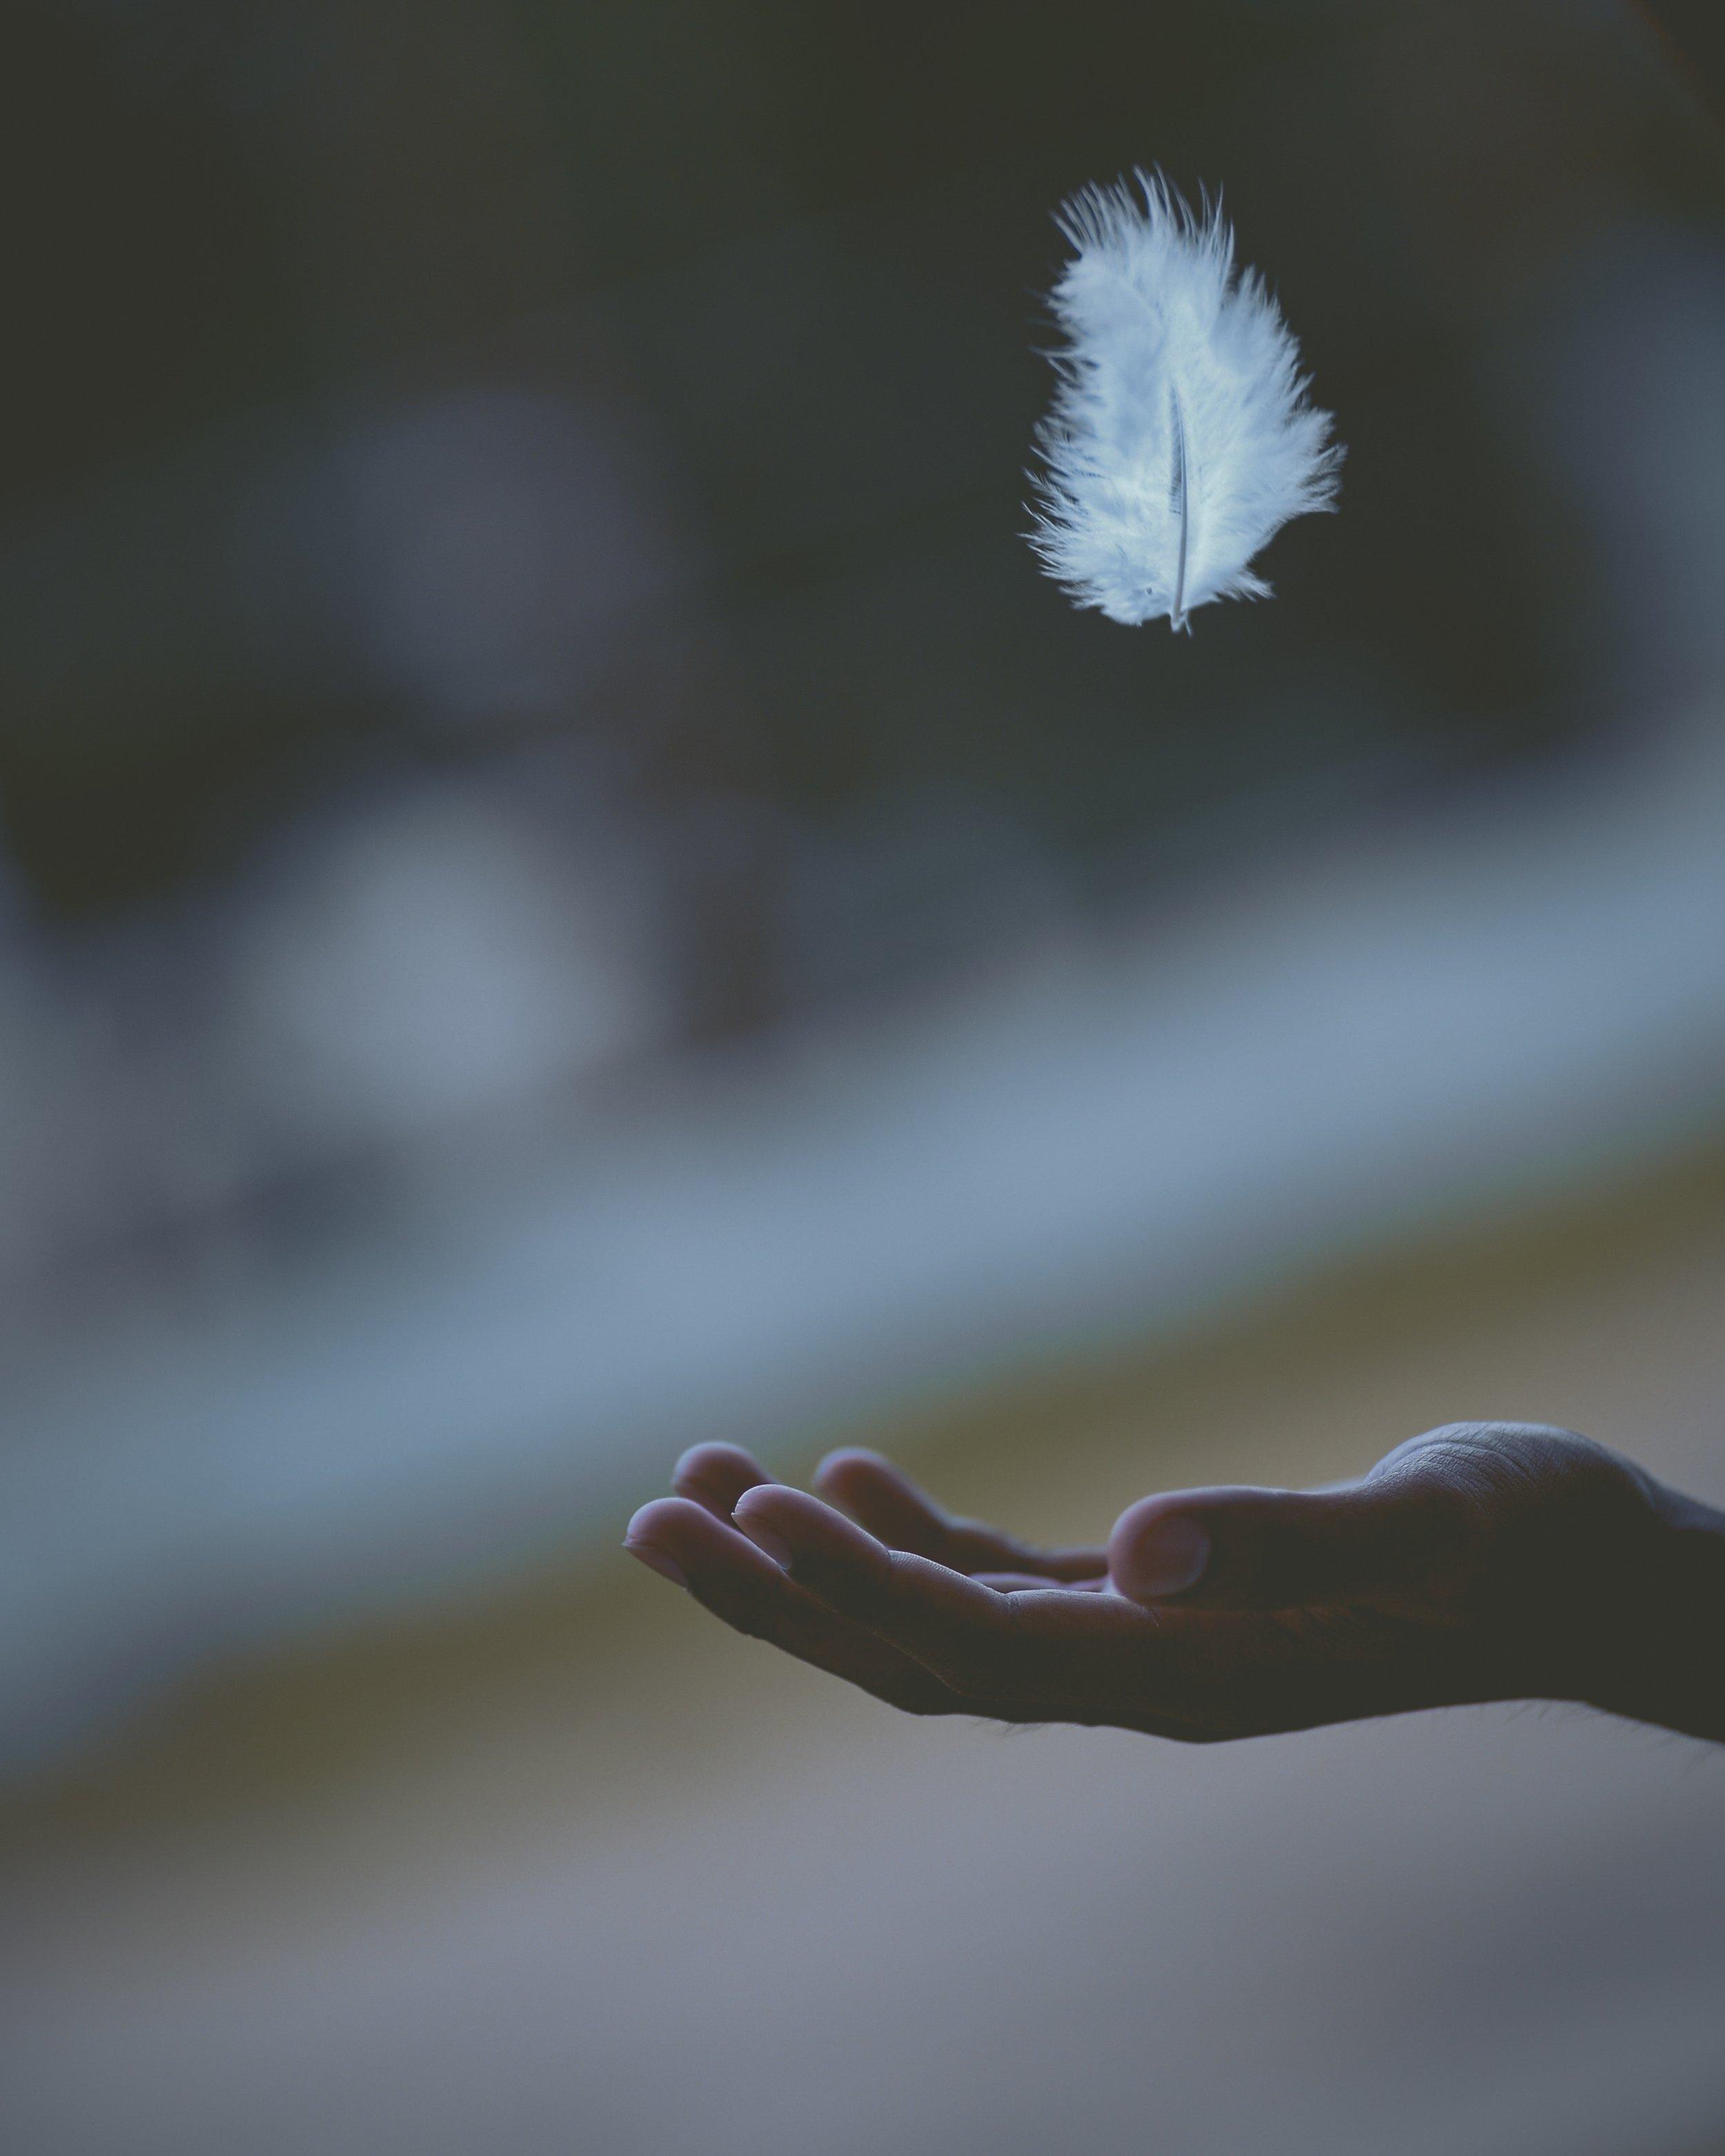 hand and feather javardh-680975-unsplash.jpg